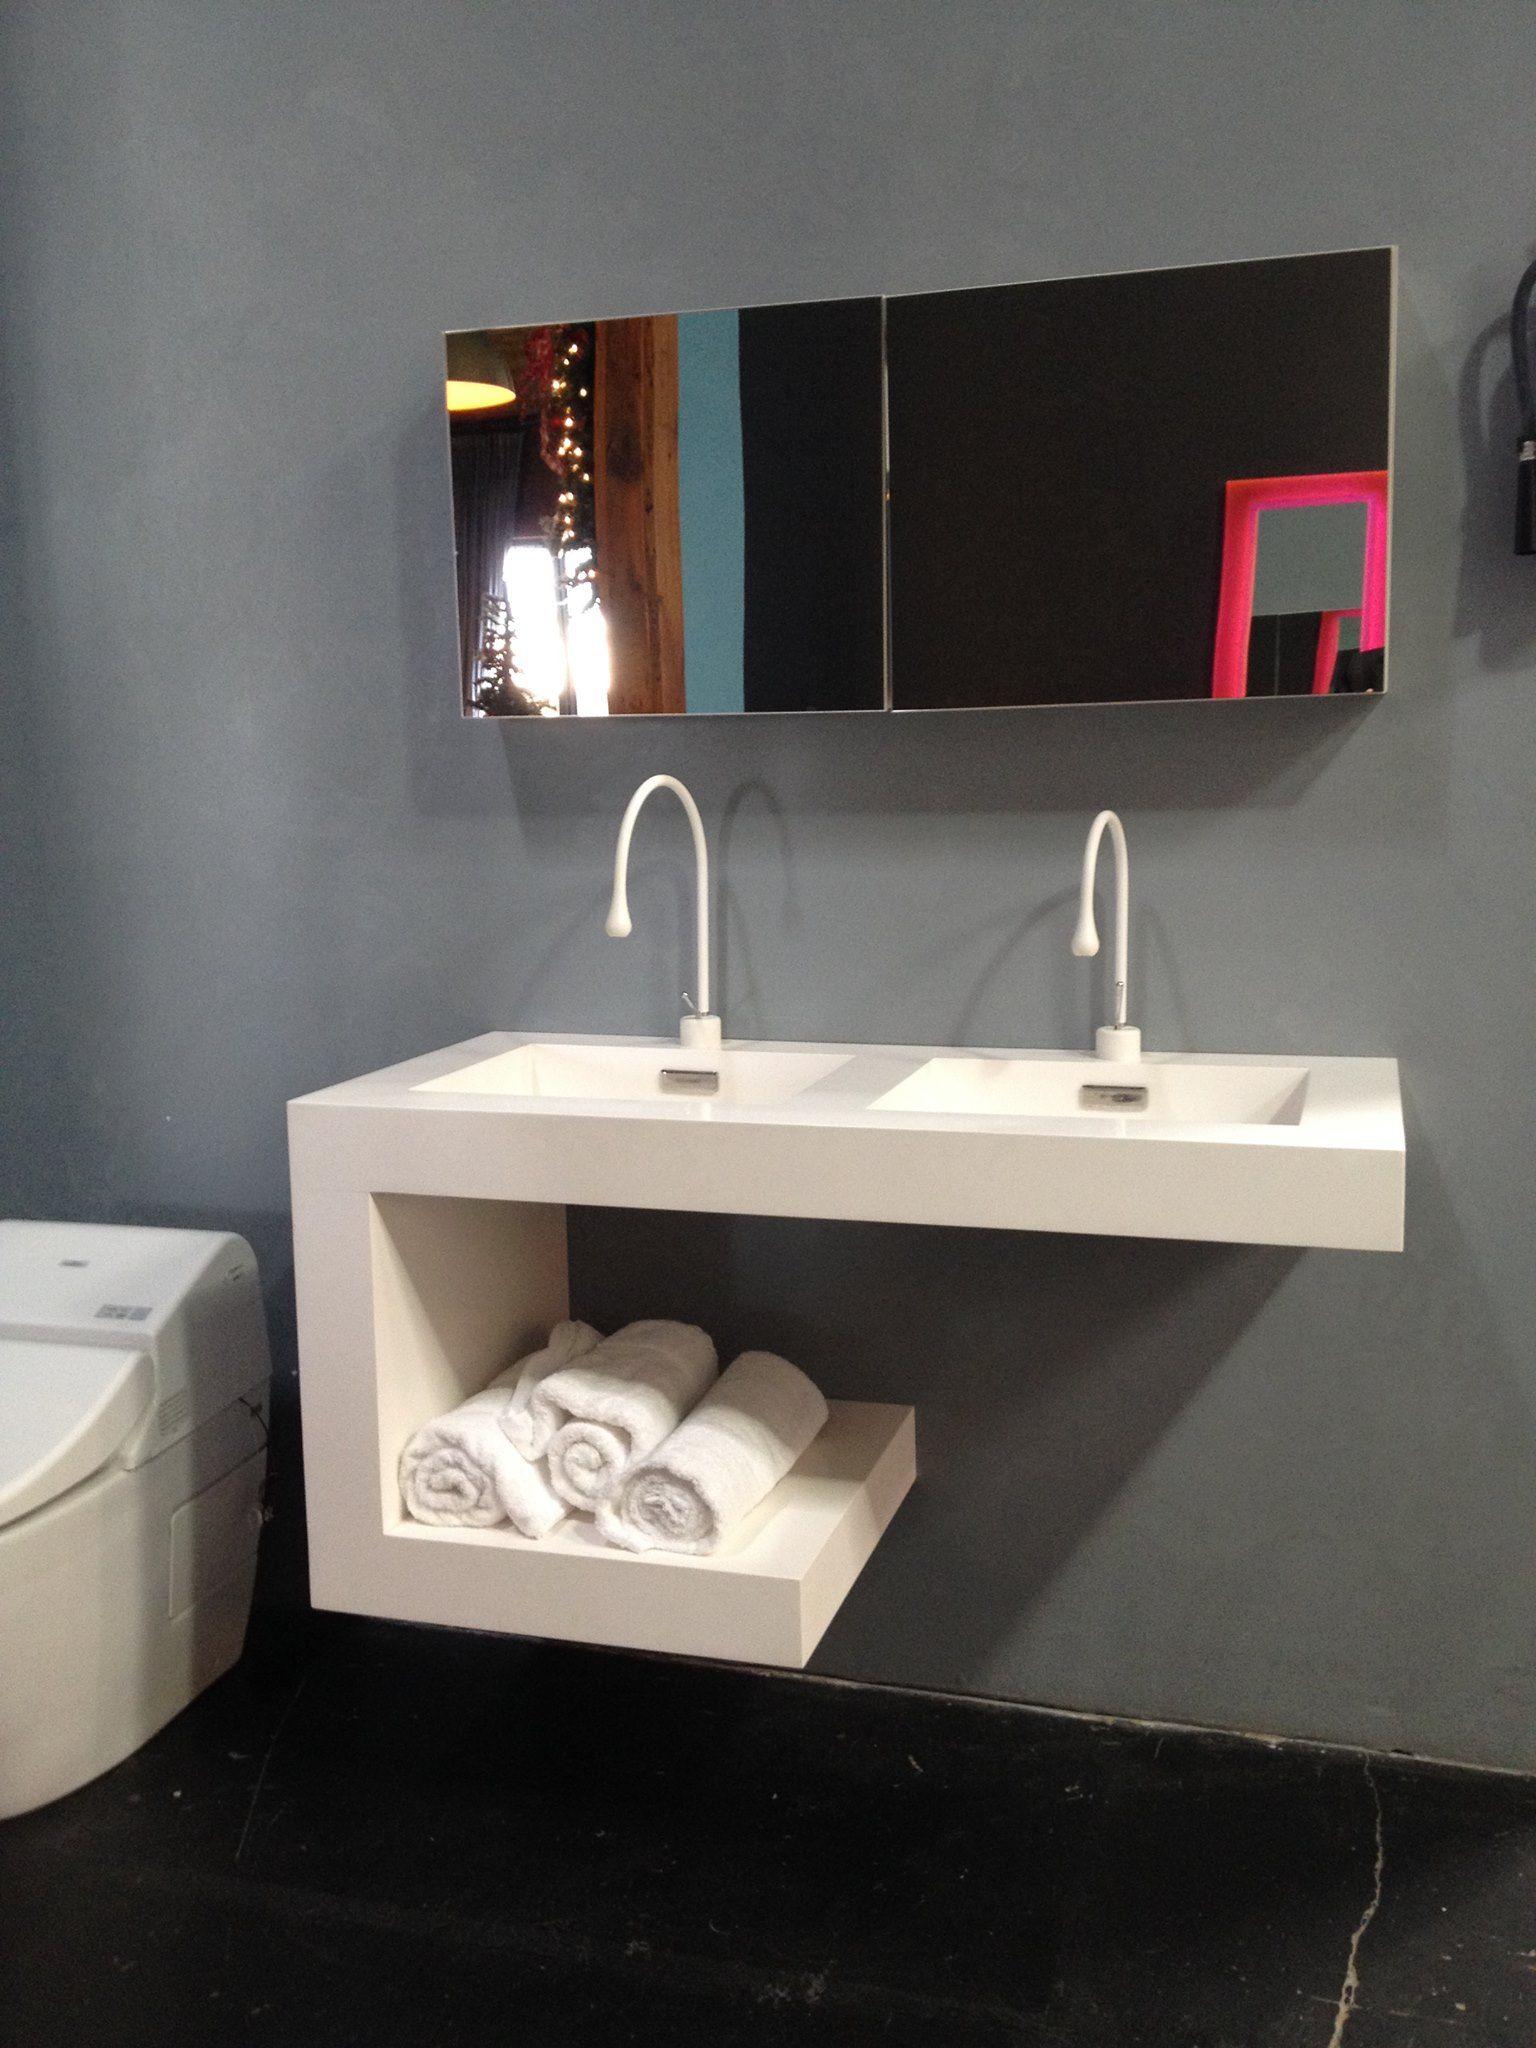 Neo Metro sink with Gessi Goccia faucets | Home / BATHROOMS ...